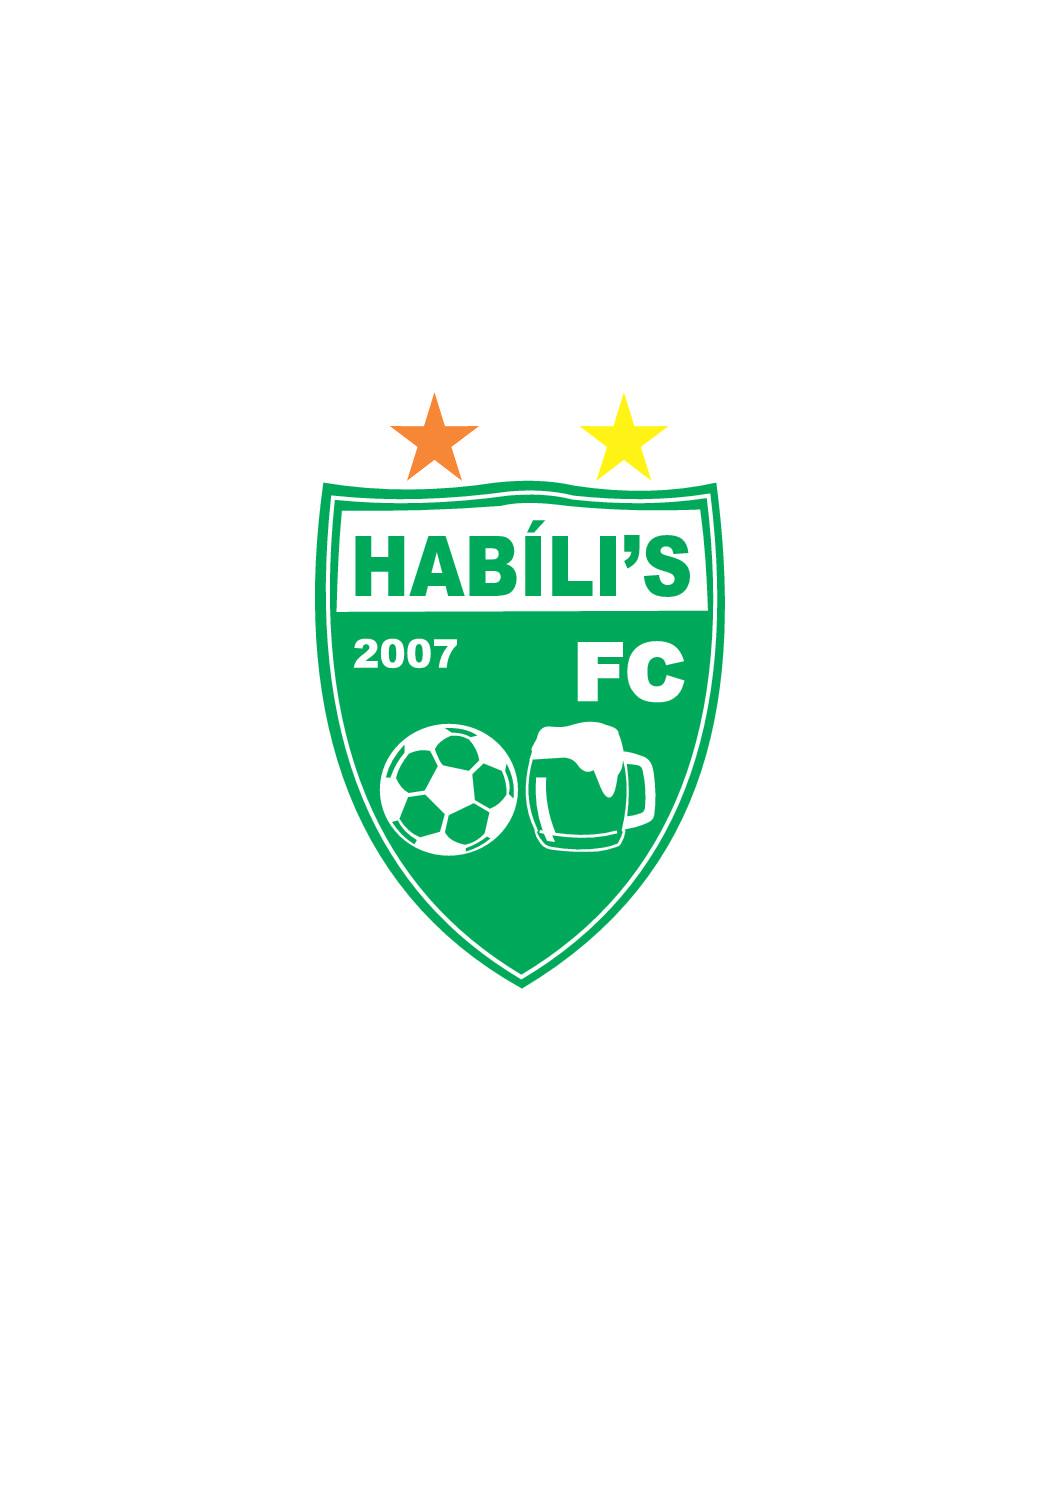 FARDAMENTO DA EQUIPE DO HABILI'S DA CIDADE DE IBIRUBÁ/RS.